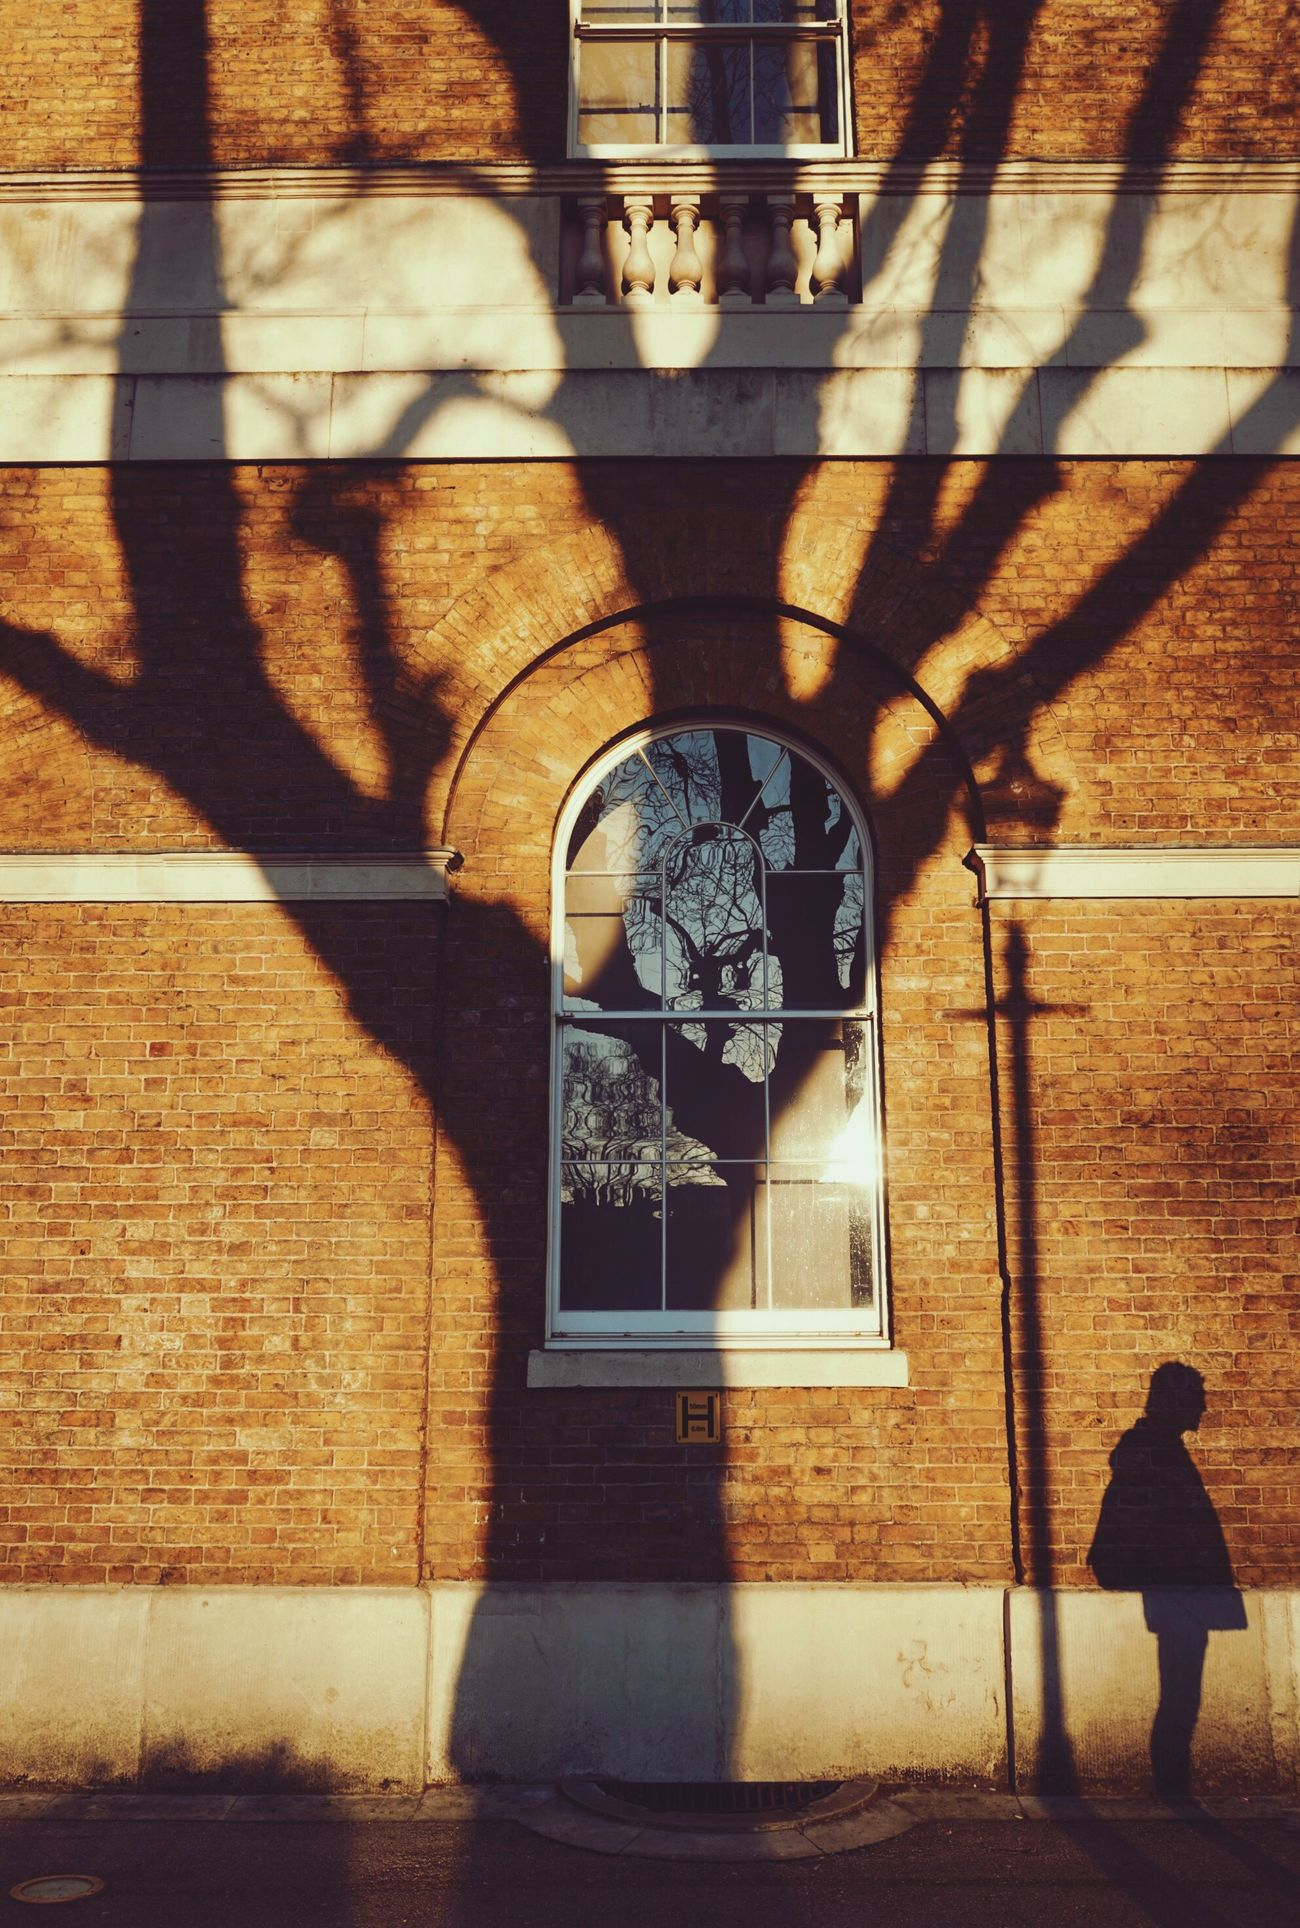 Three shadows Sunlight Architecture Shadow Street Streetphotography London EyeEm Best Shots Eyeemphoto Sony A7RII EyeEmBestPics VSCO Snapseed Chelsea Window Tree Adapted To The City